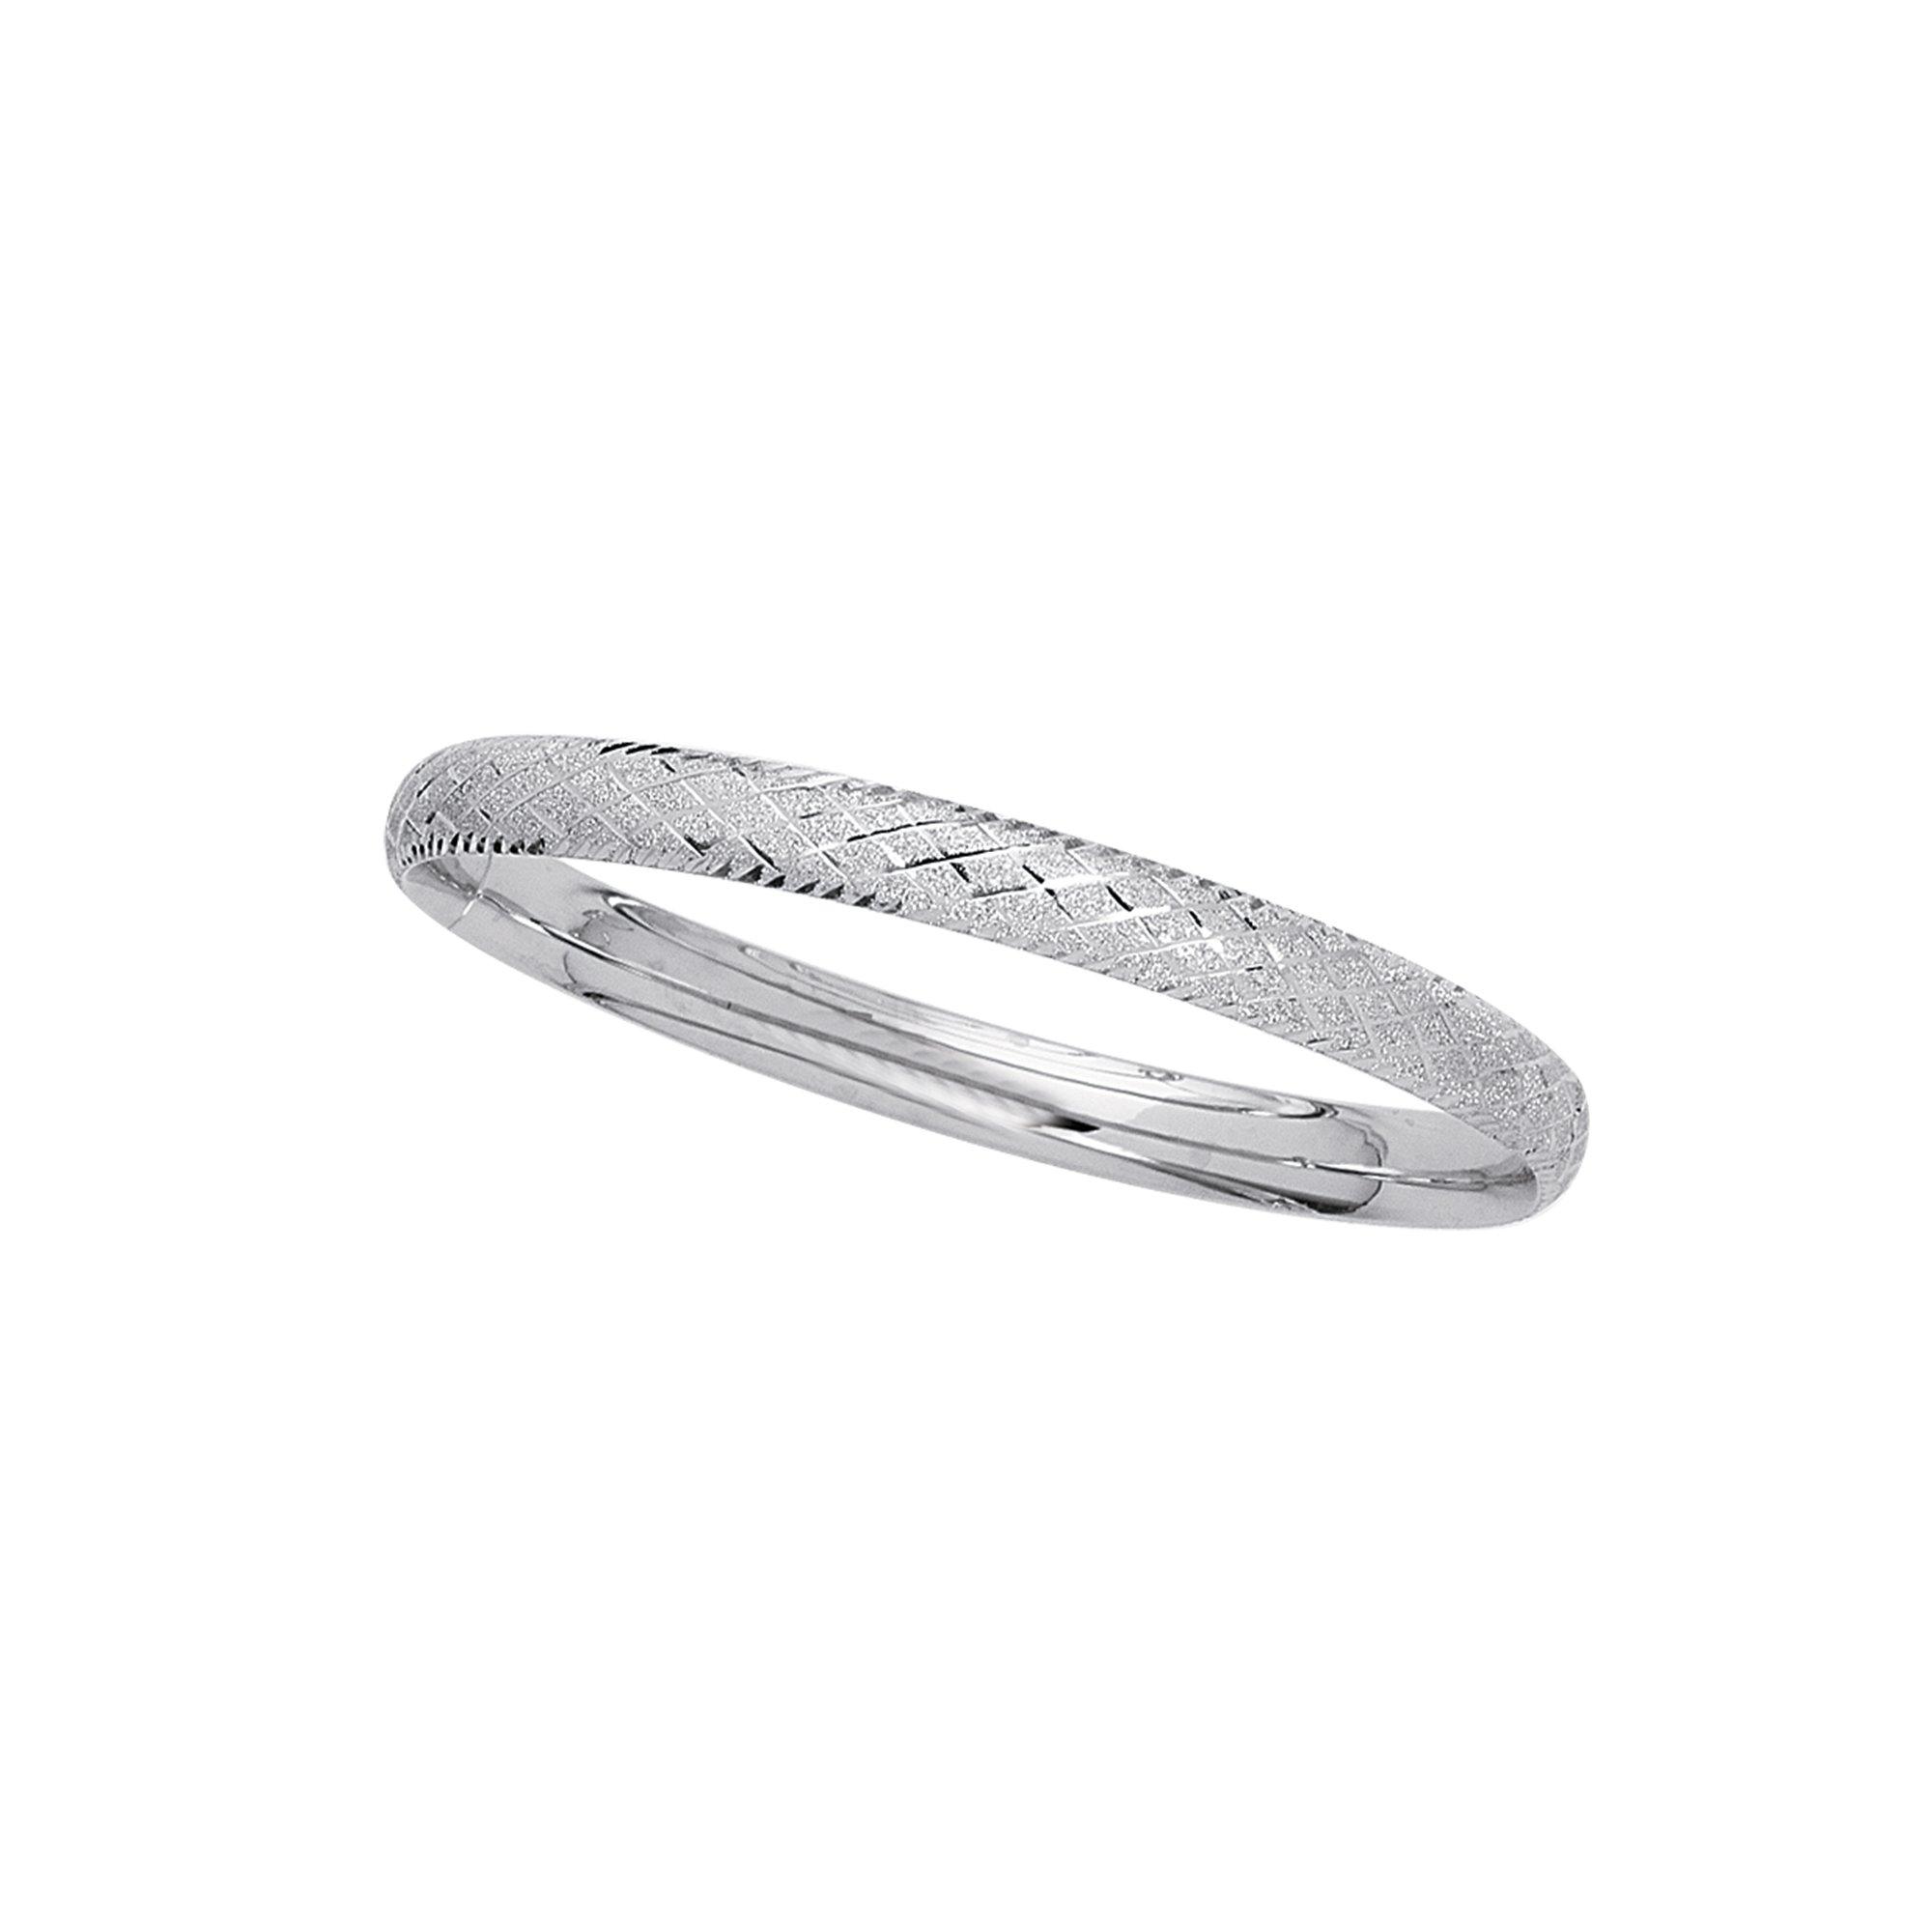 14K White Gold Shiny Textured Sparkle 6mm wide Bangle 7'' Bracelet Diamond shape Pattern with Claps